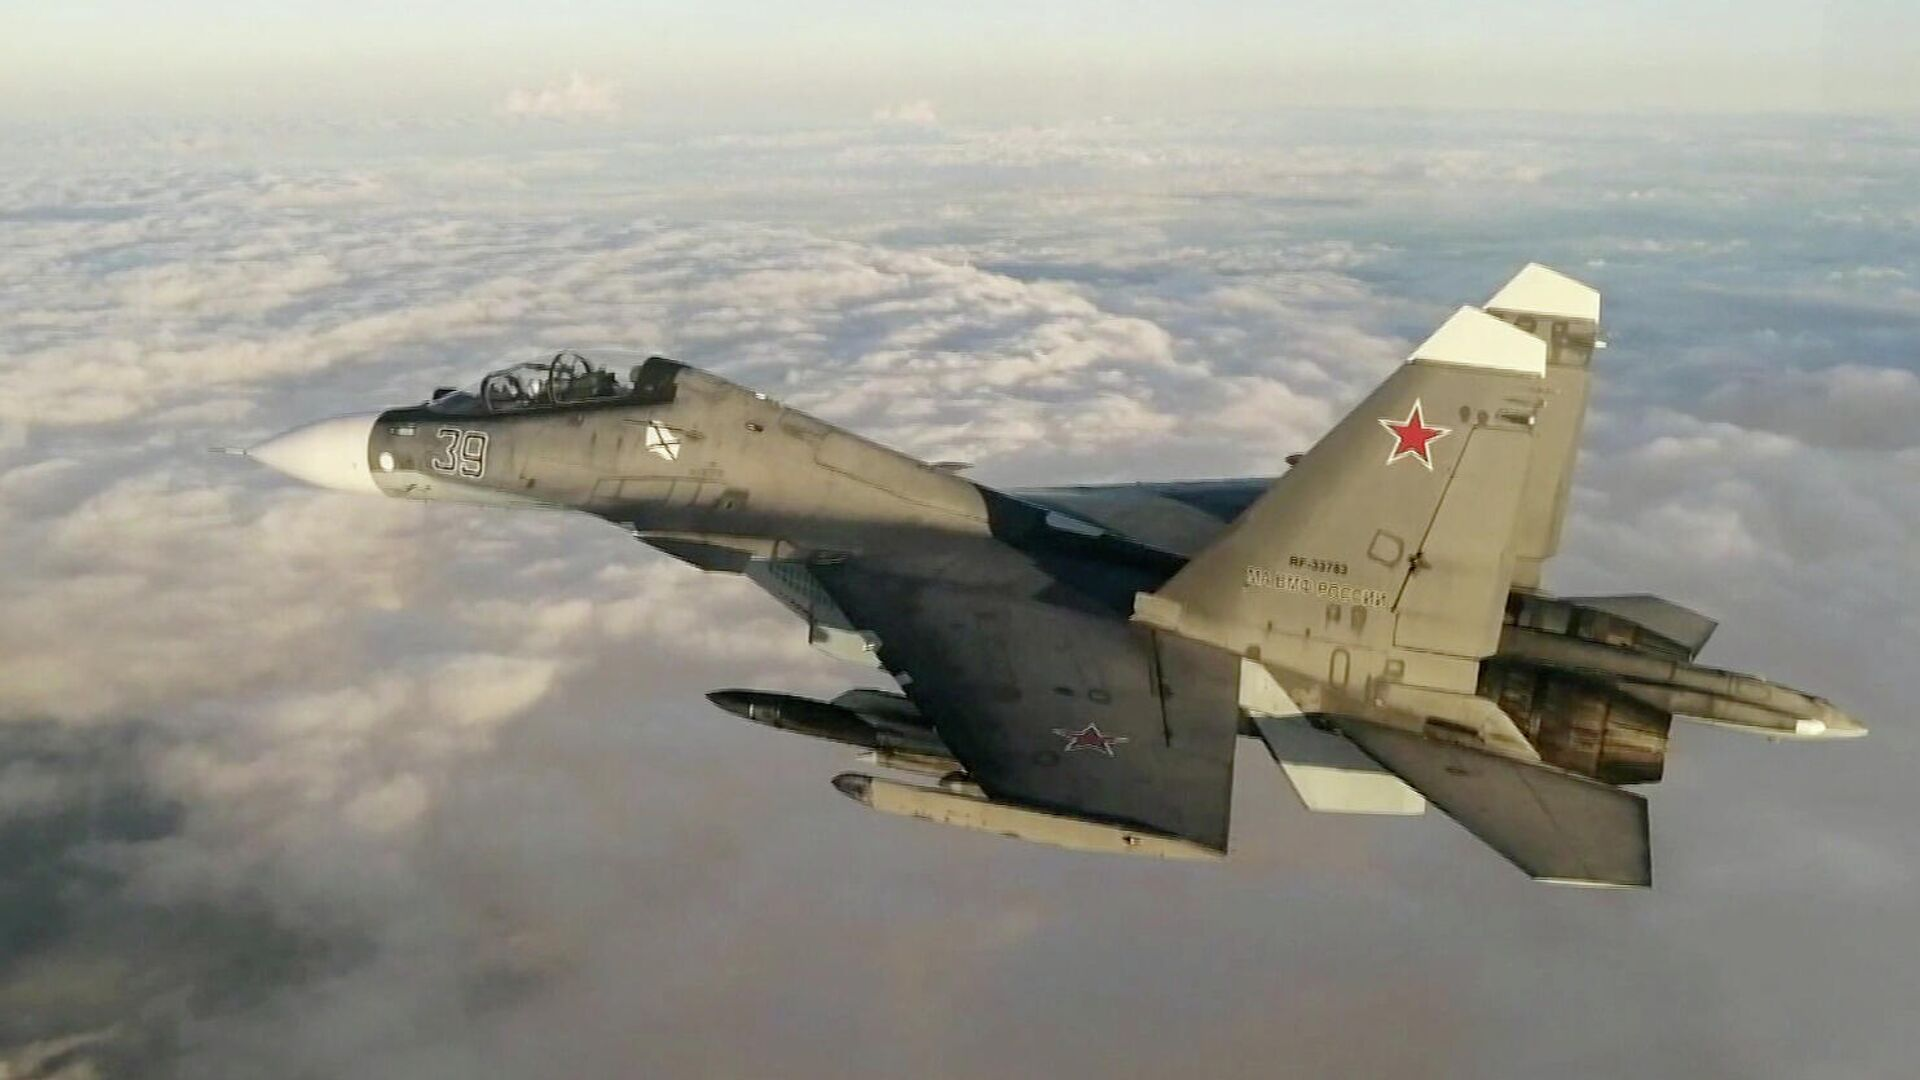 Un Su-30, caza ruso - Sputnik Mundo, 1920, 12.08.2021